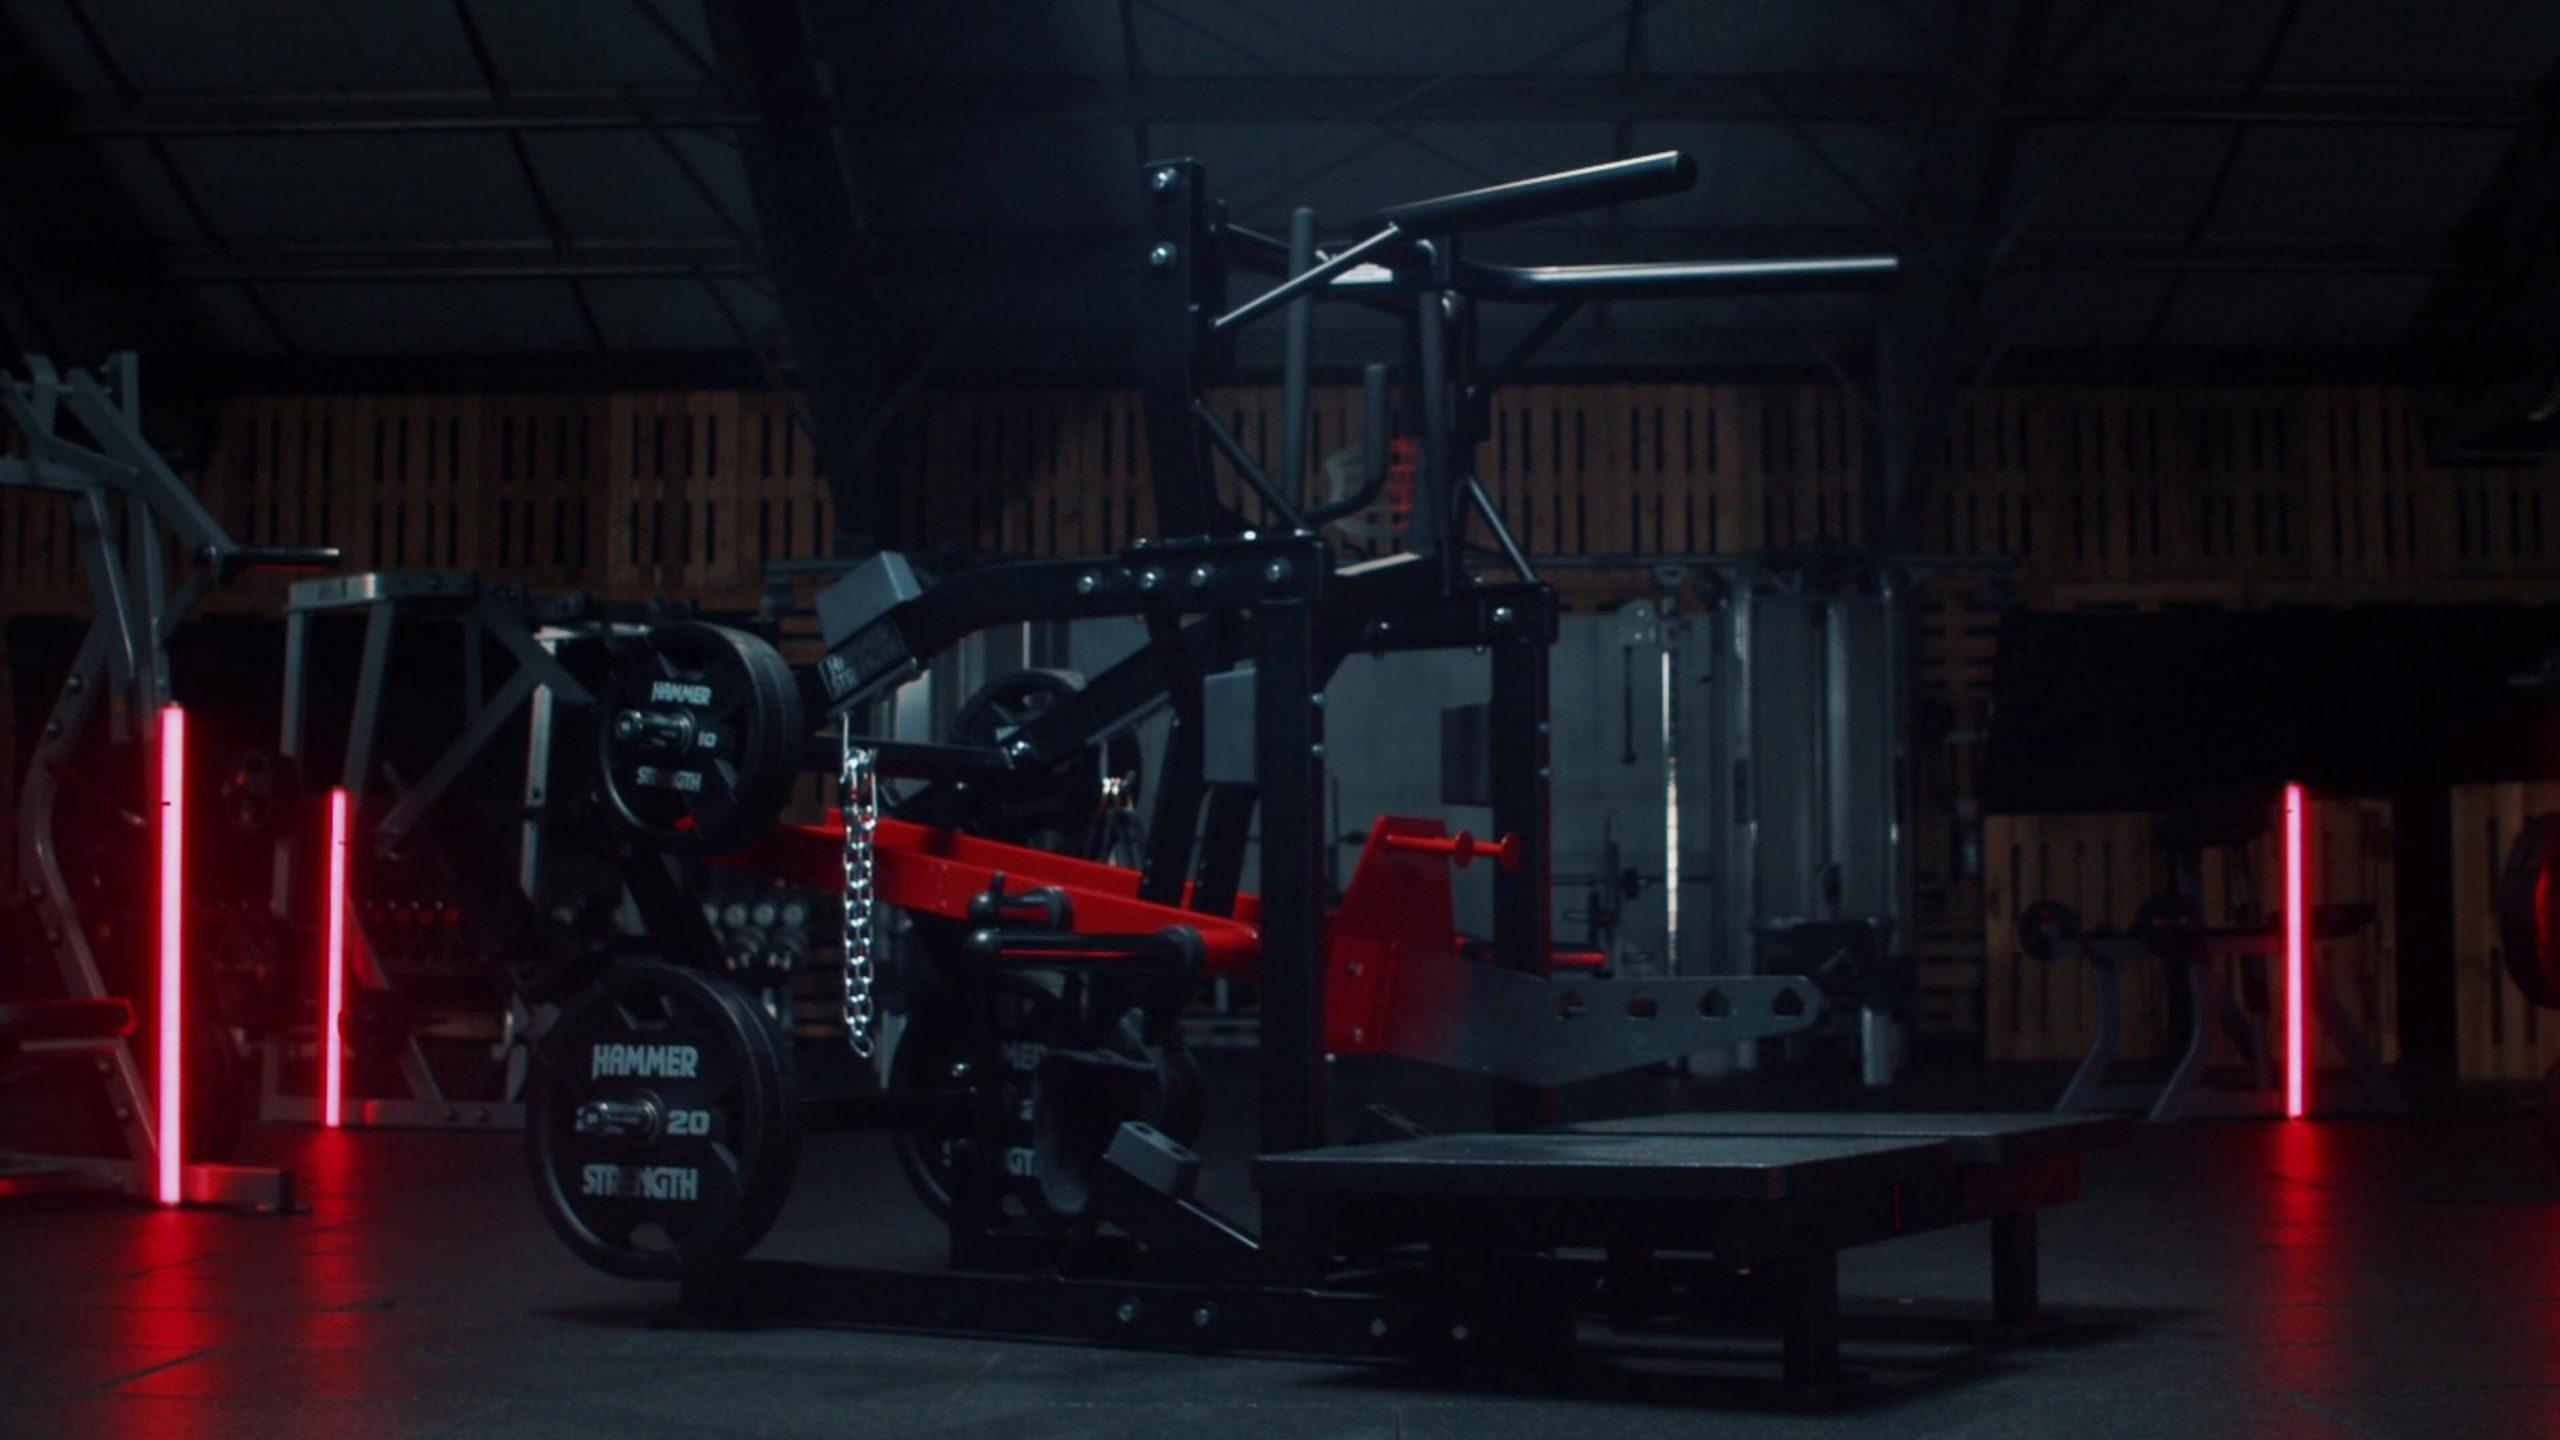 Life Fitness Hammer Strength Belt Squat